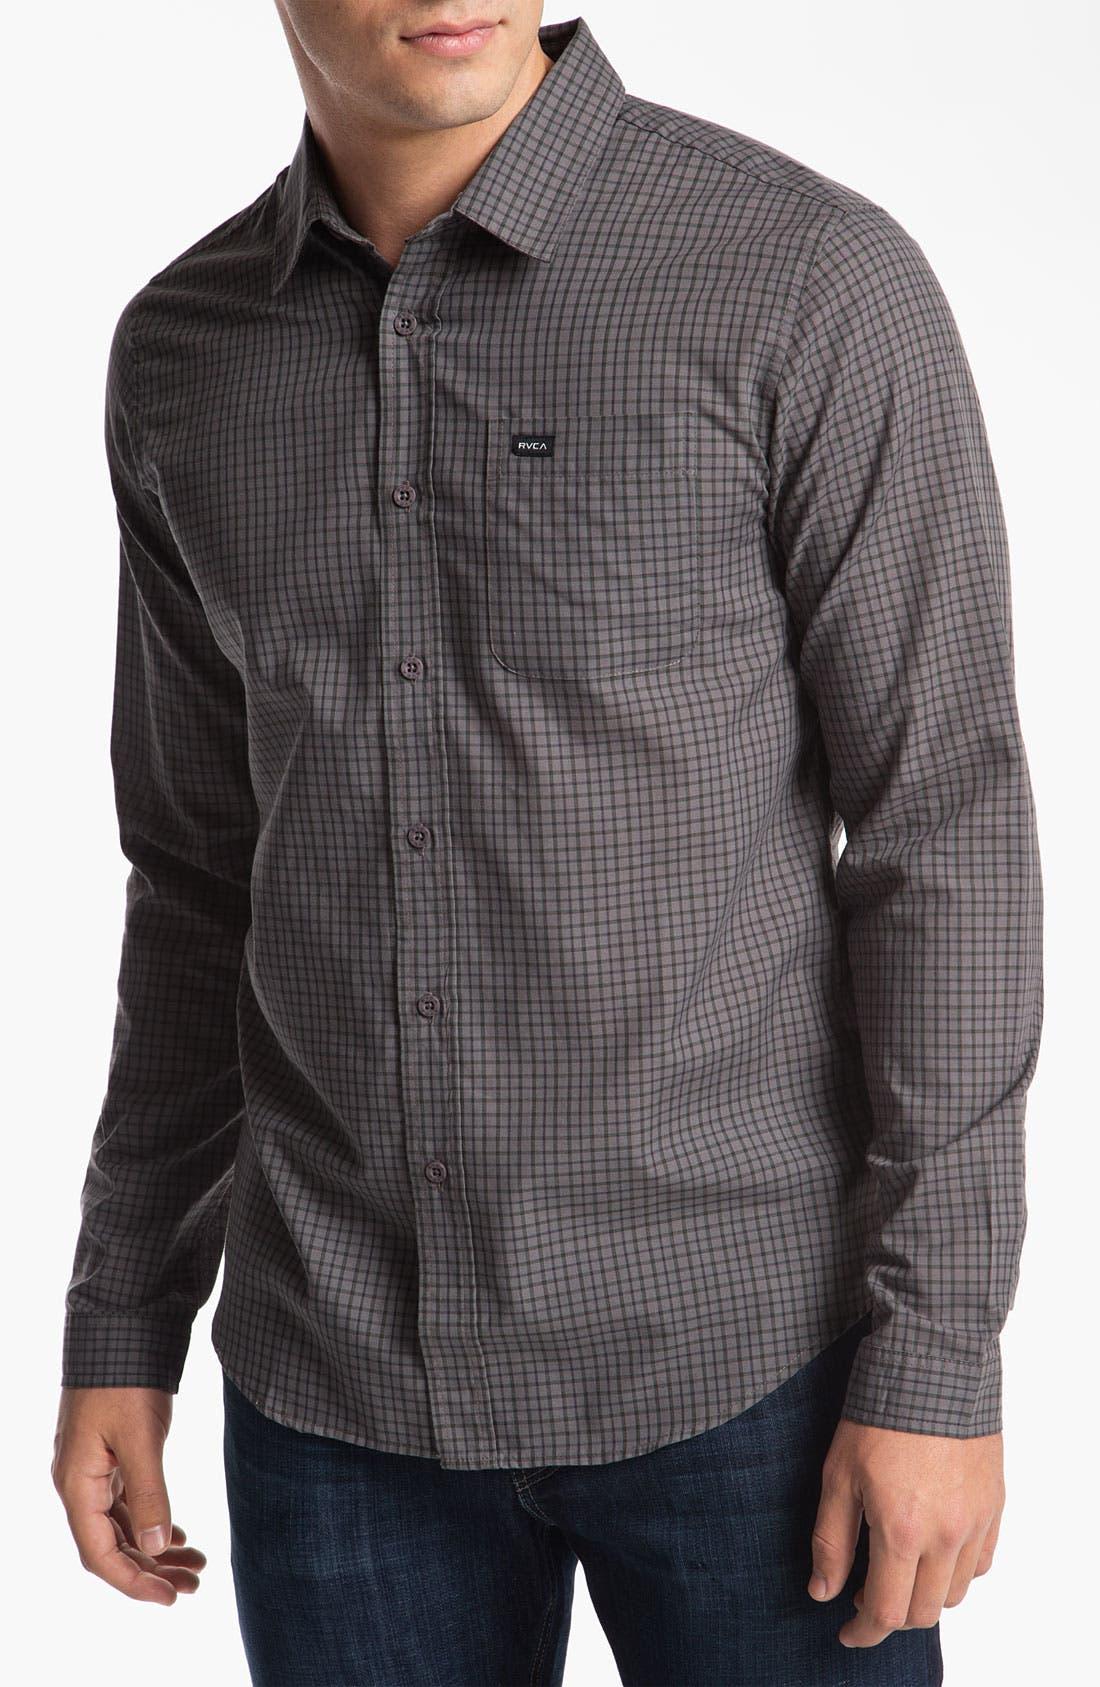 Main Image - RVCA 'Borealis' Check Woven Shirt